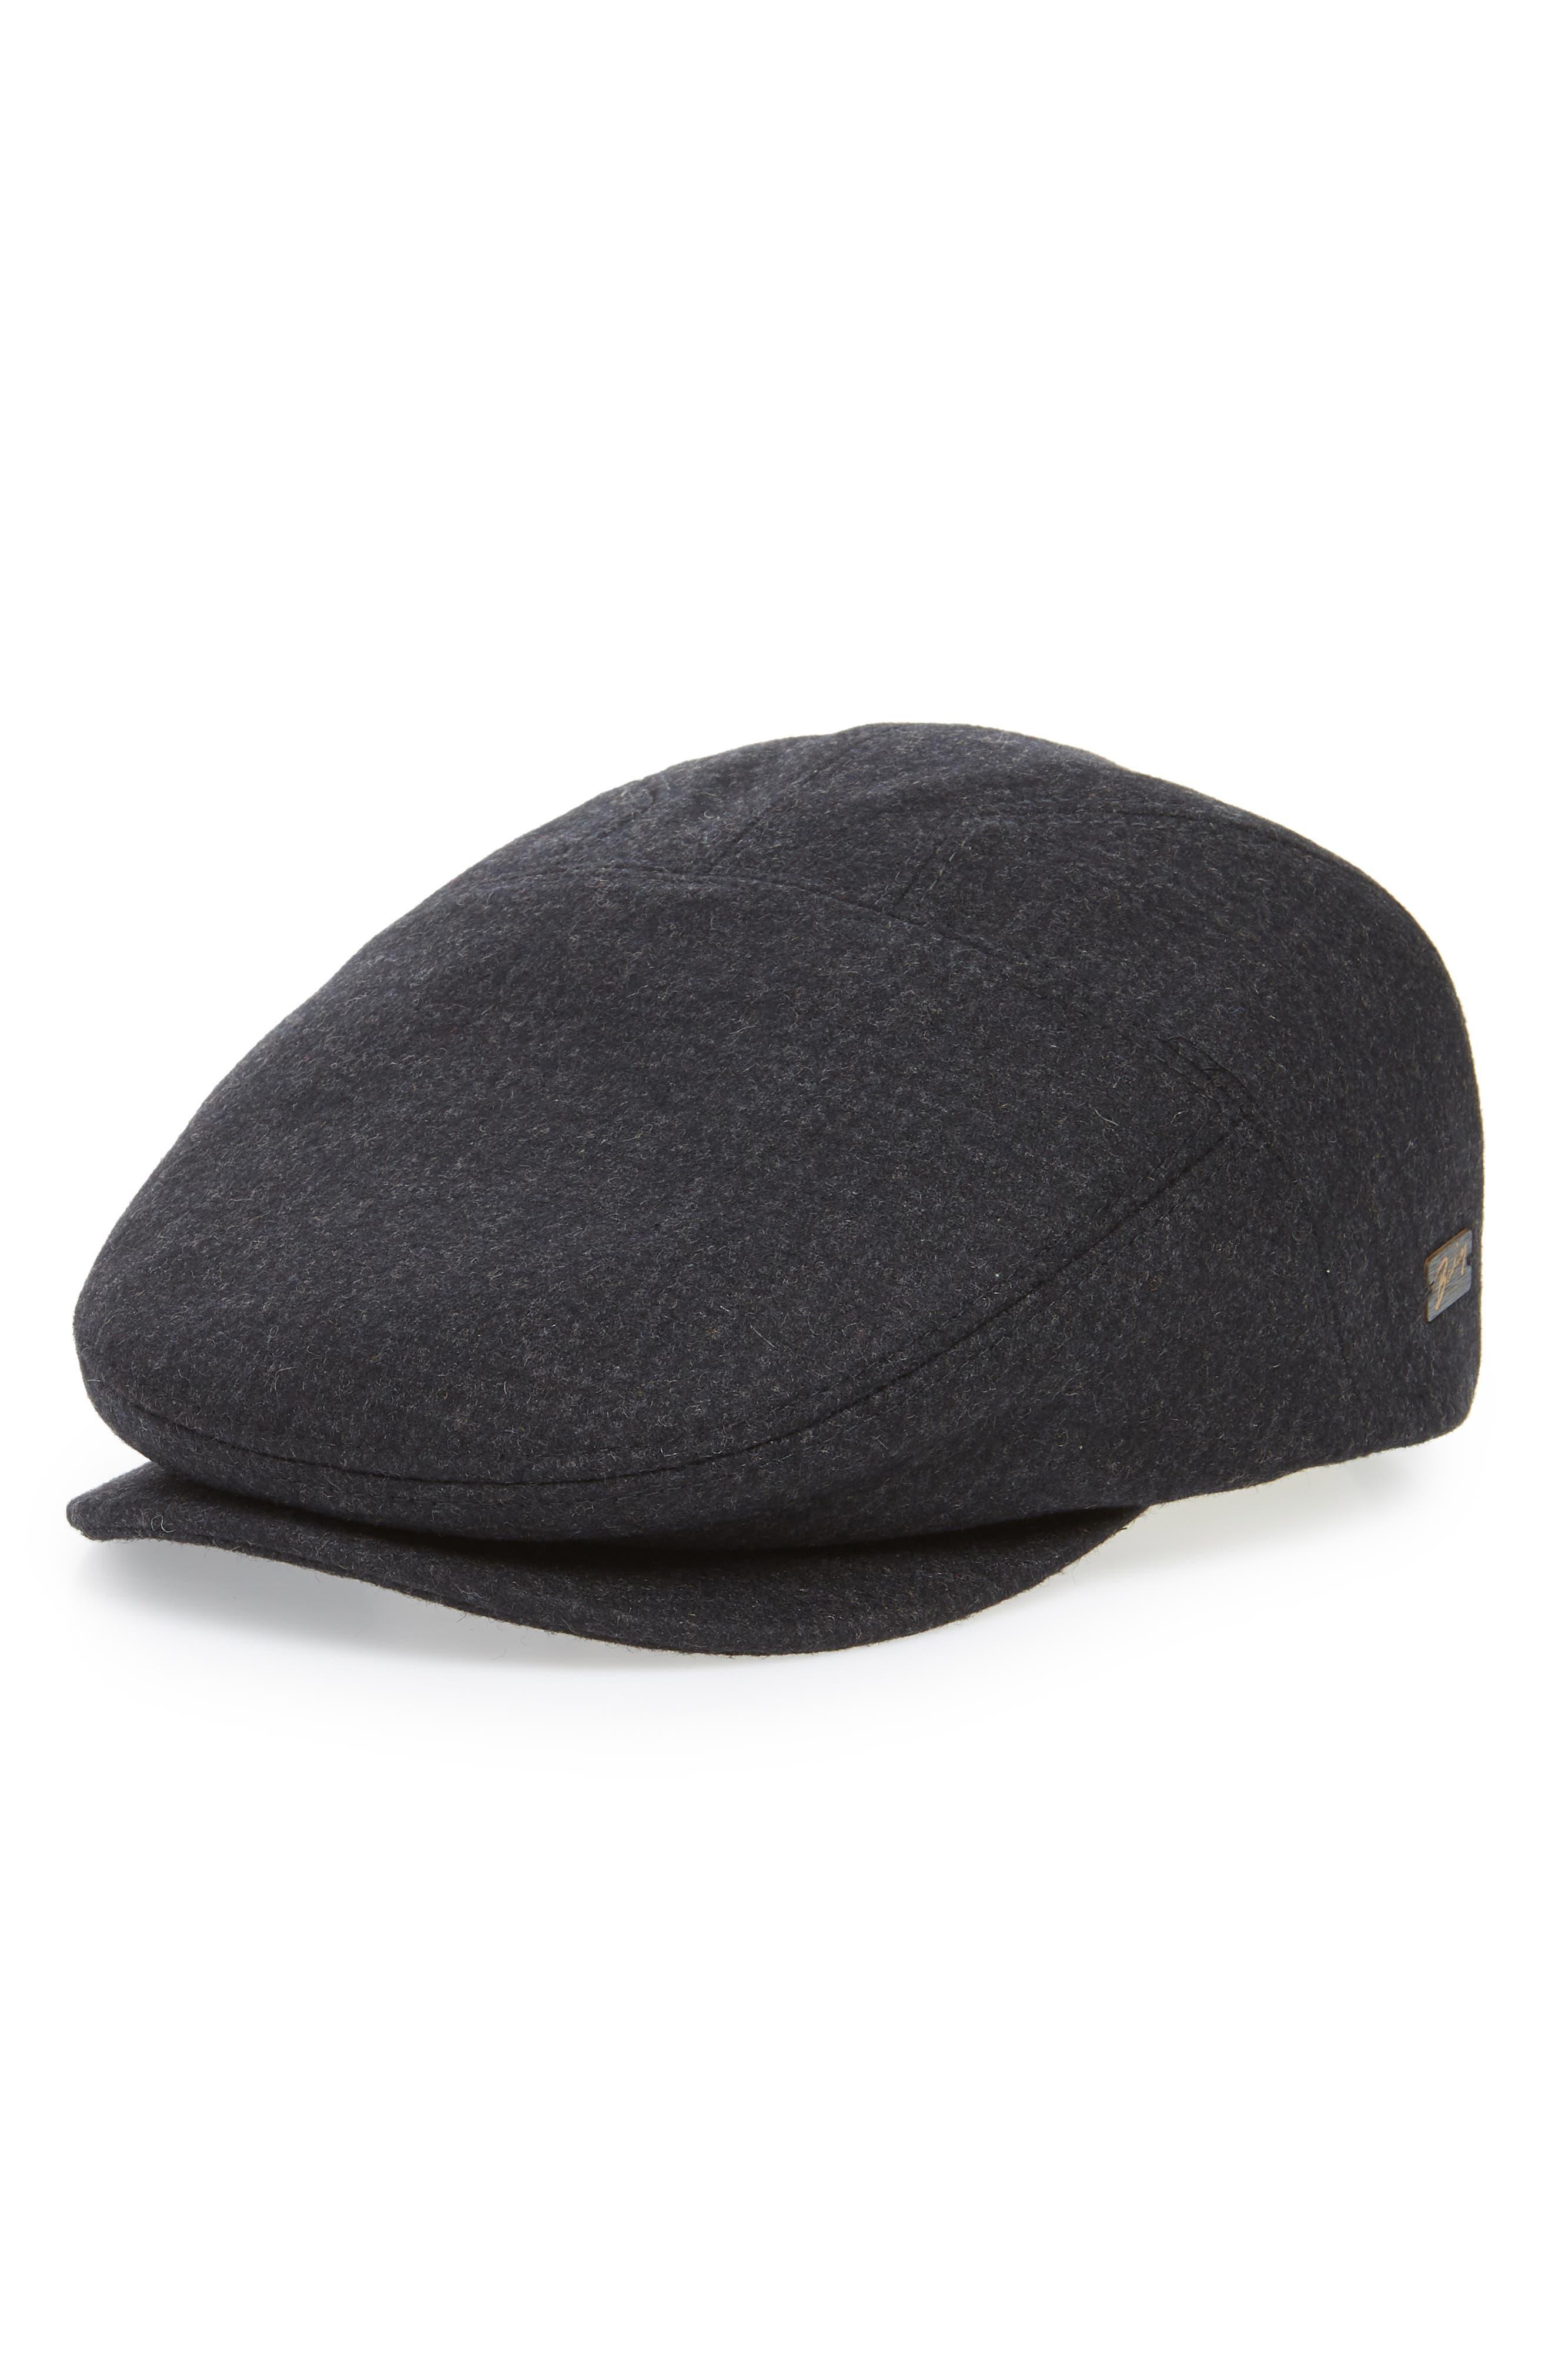 Ormond Driving Cap,                         Main,                         color, 003